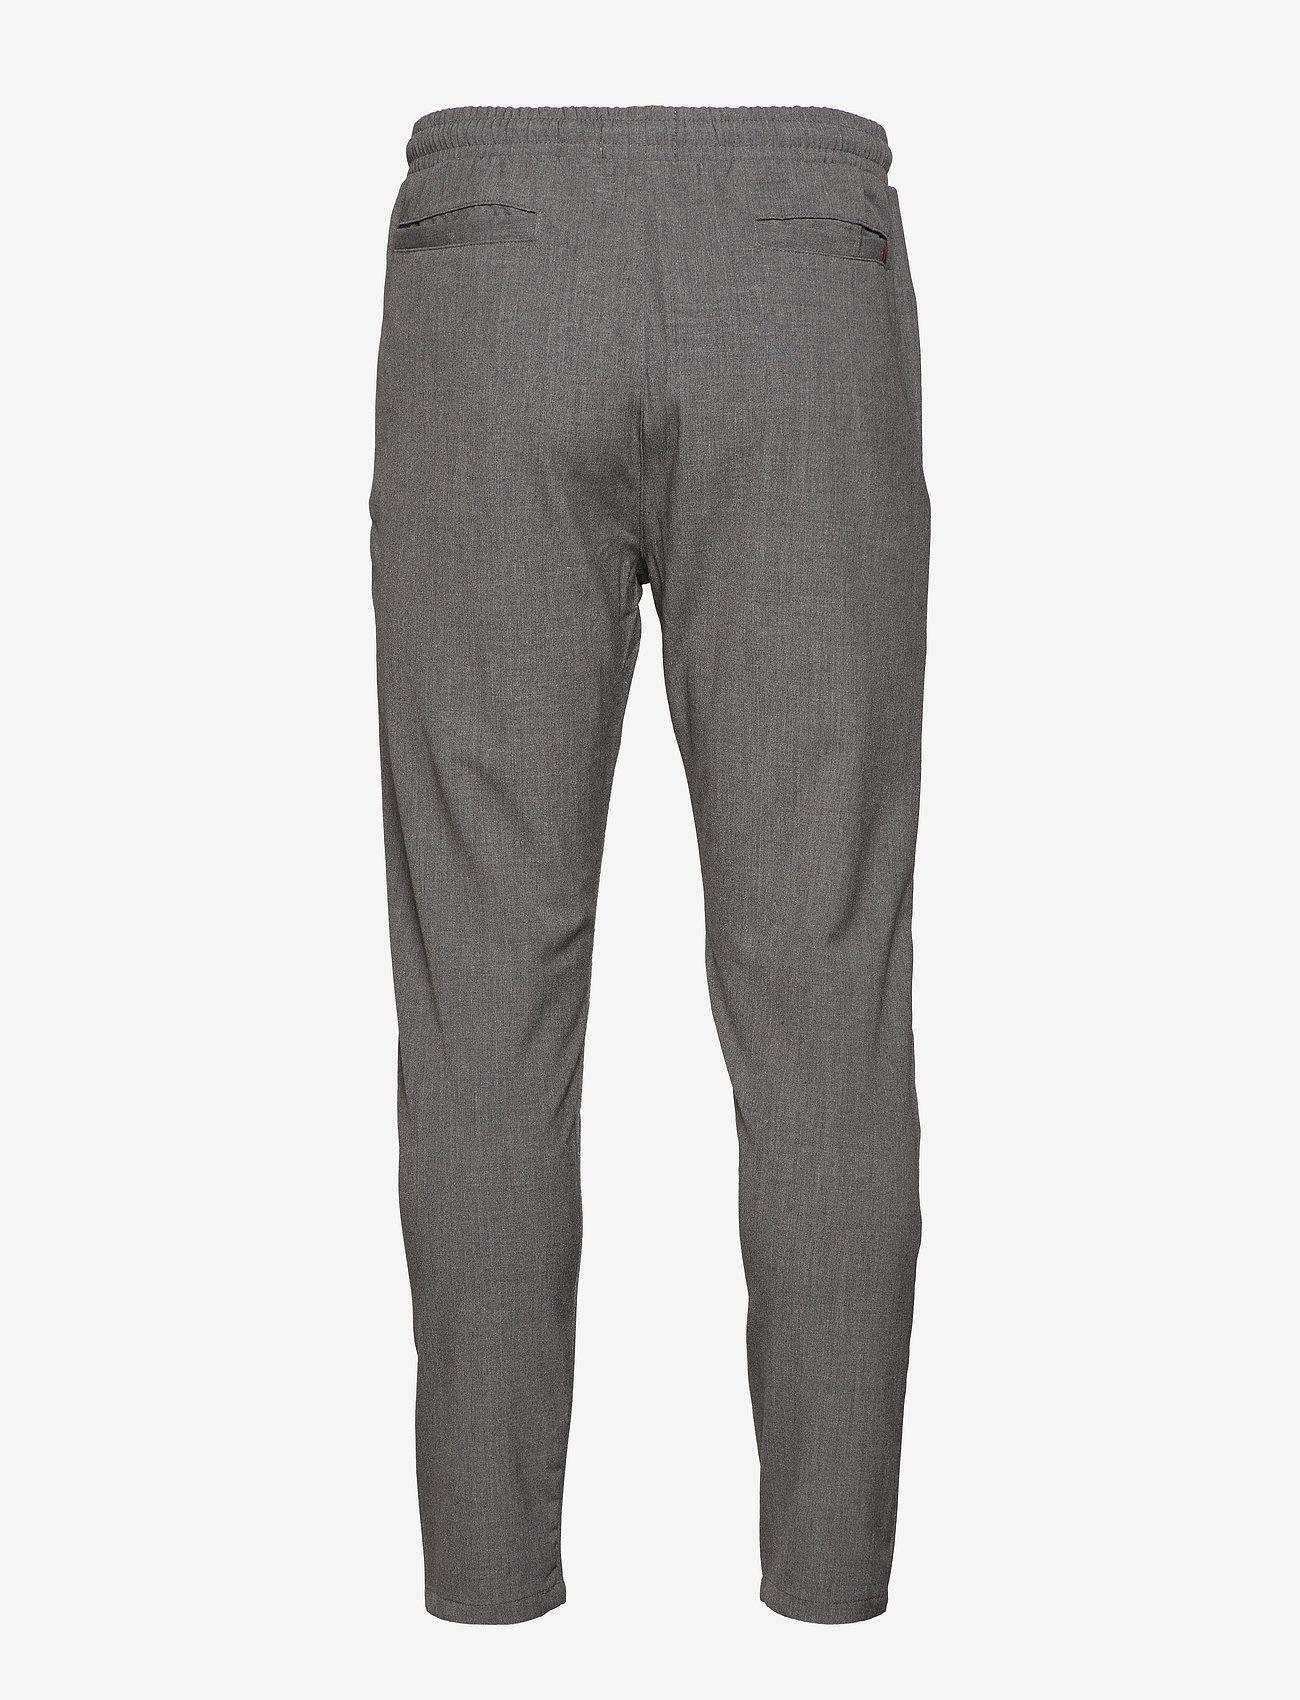 Denim project Suit pant - Bukser GREY - Menn Klær